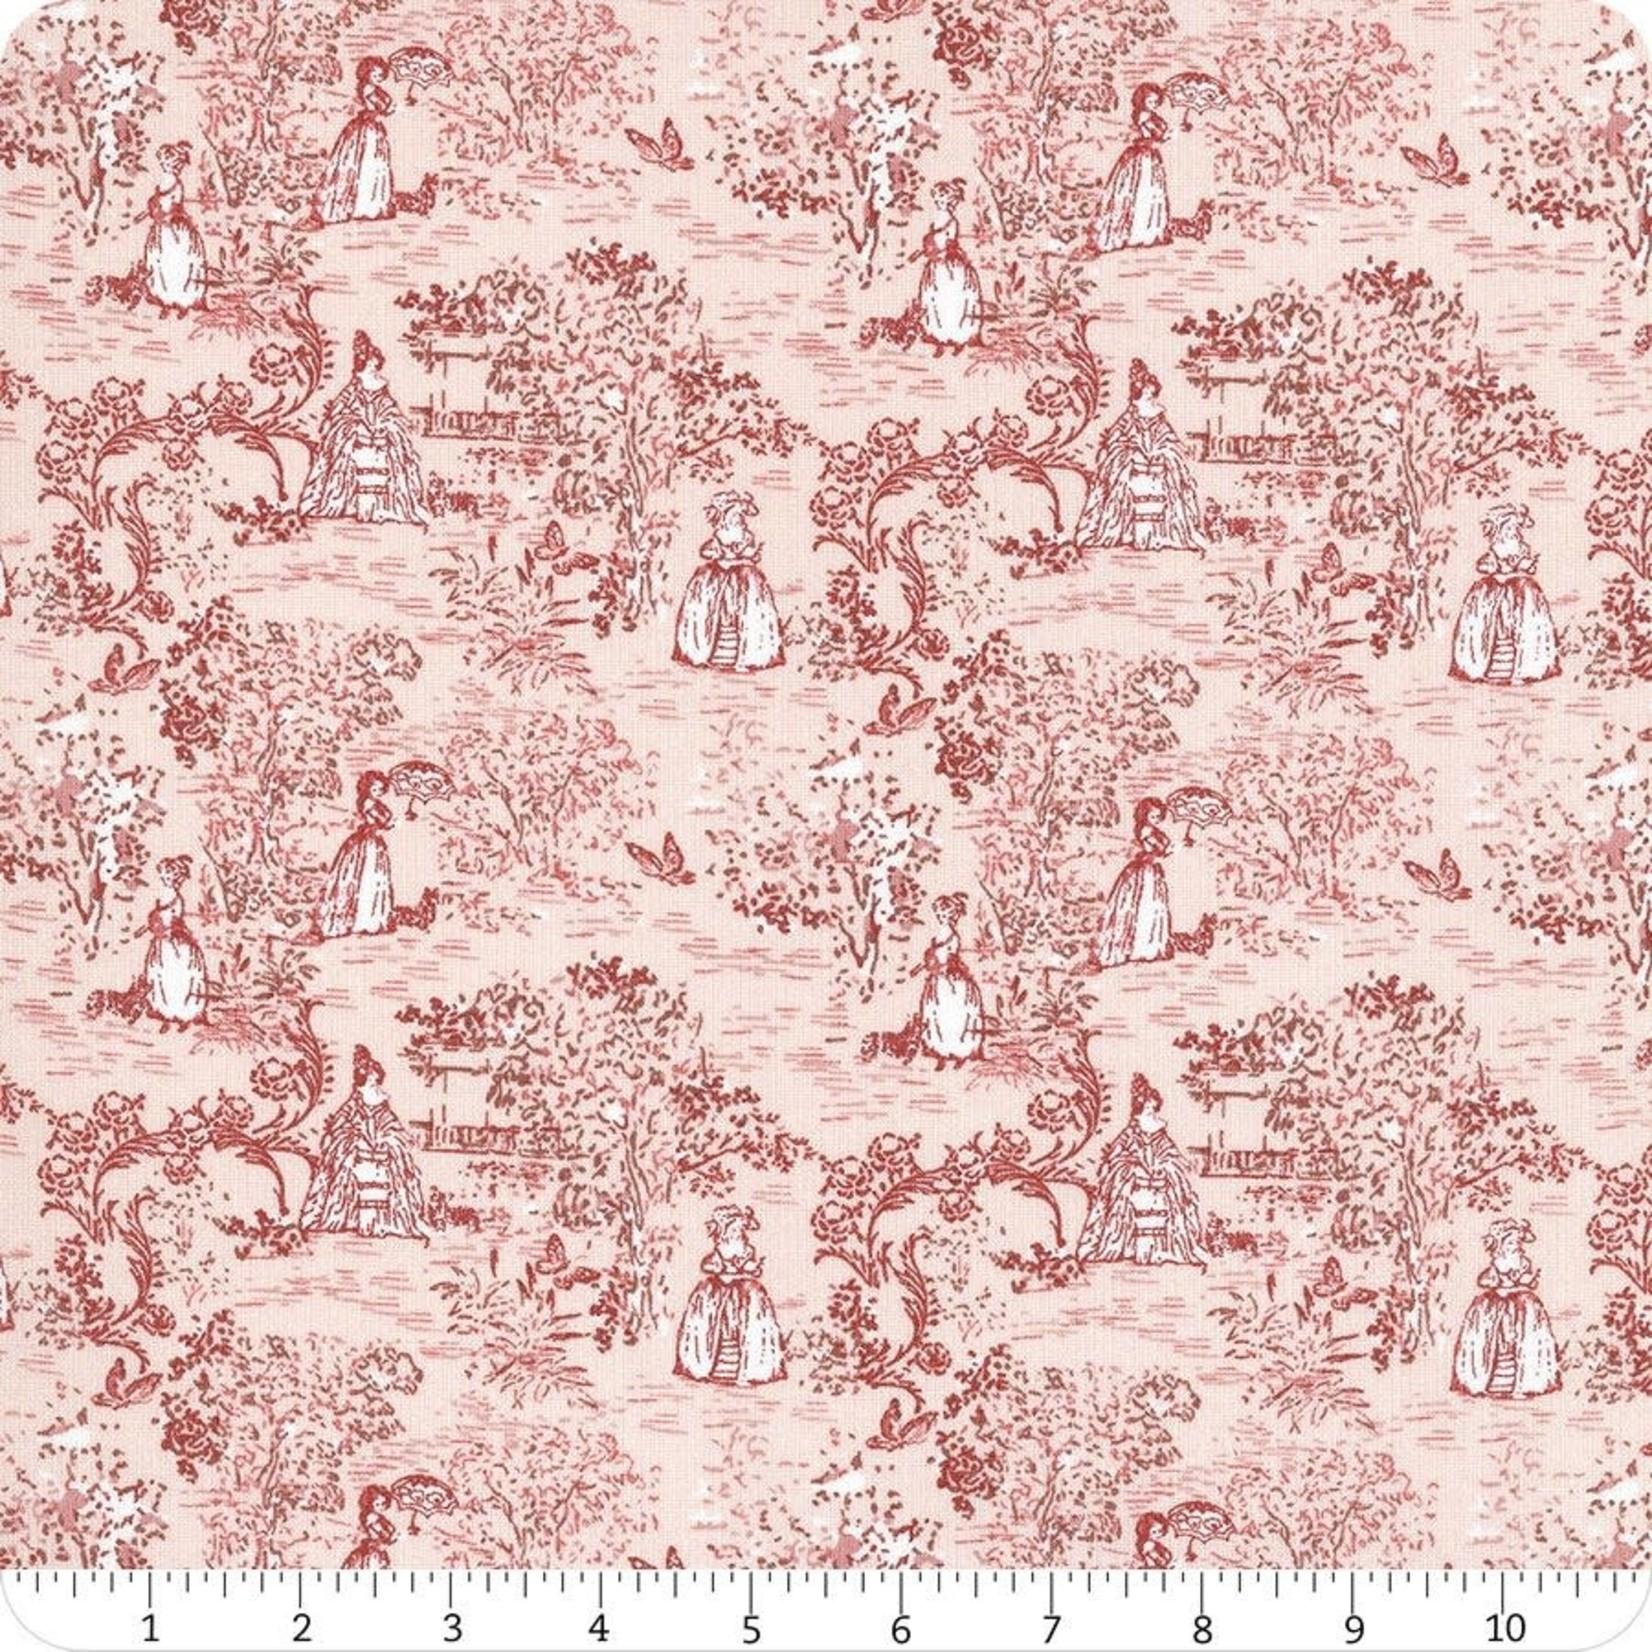 Lecien Fabrics Madame Fleur - Pink